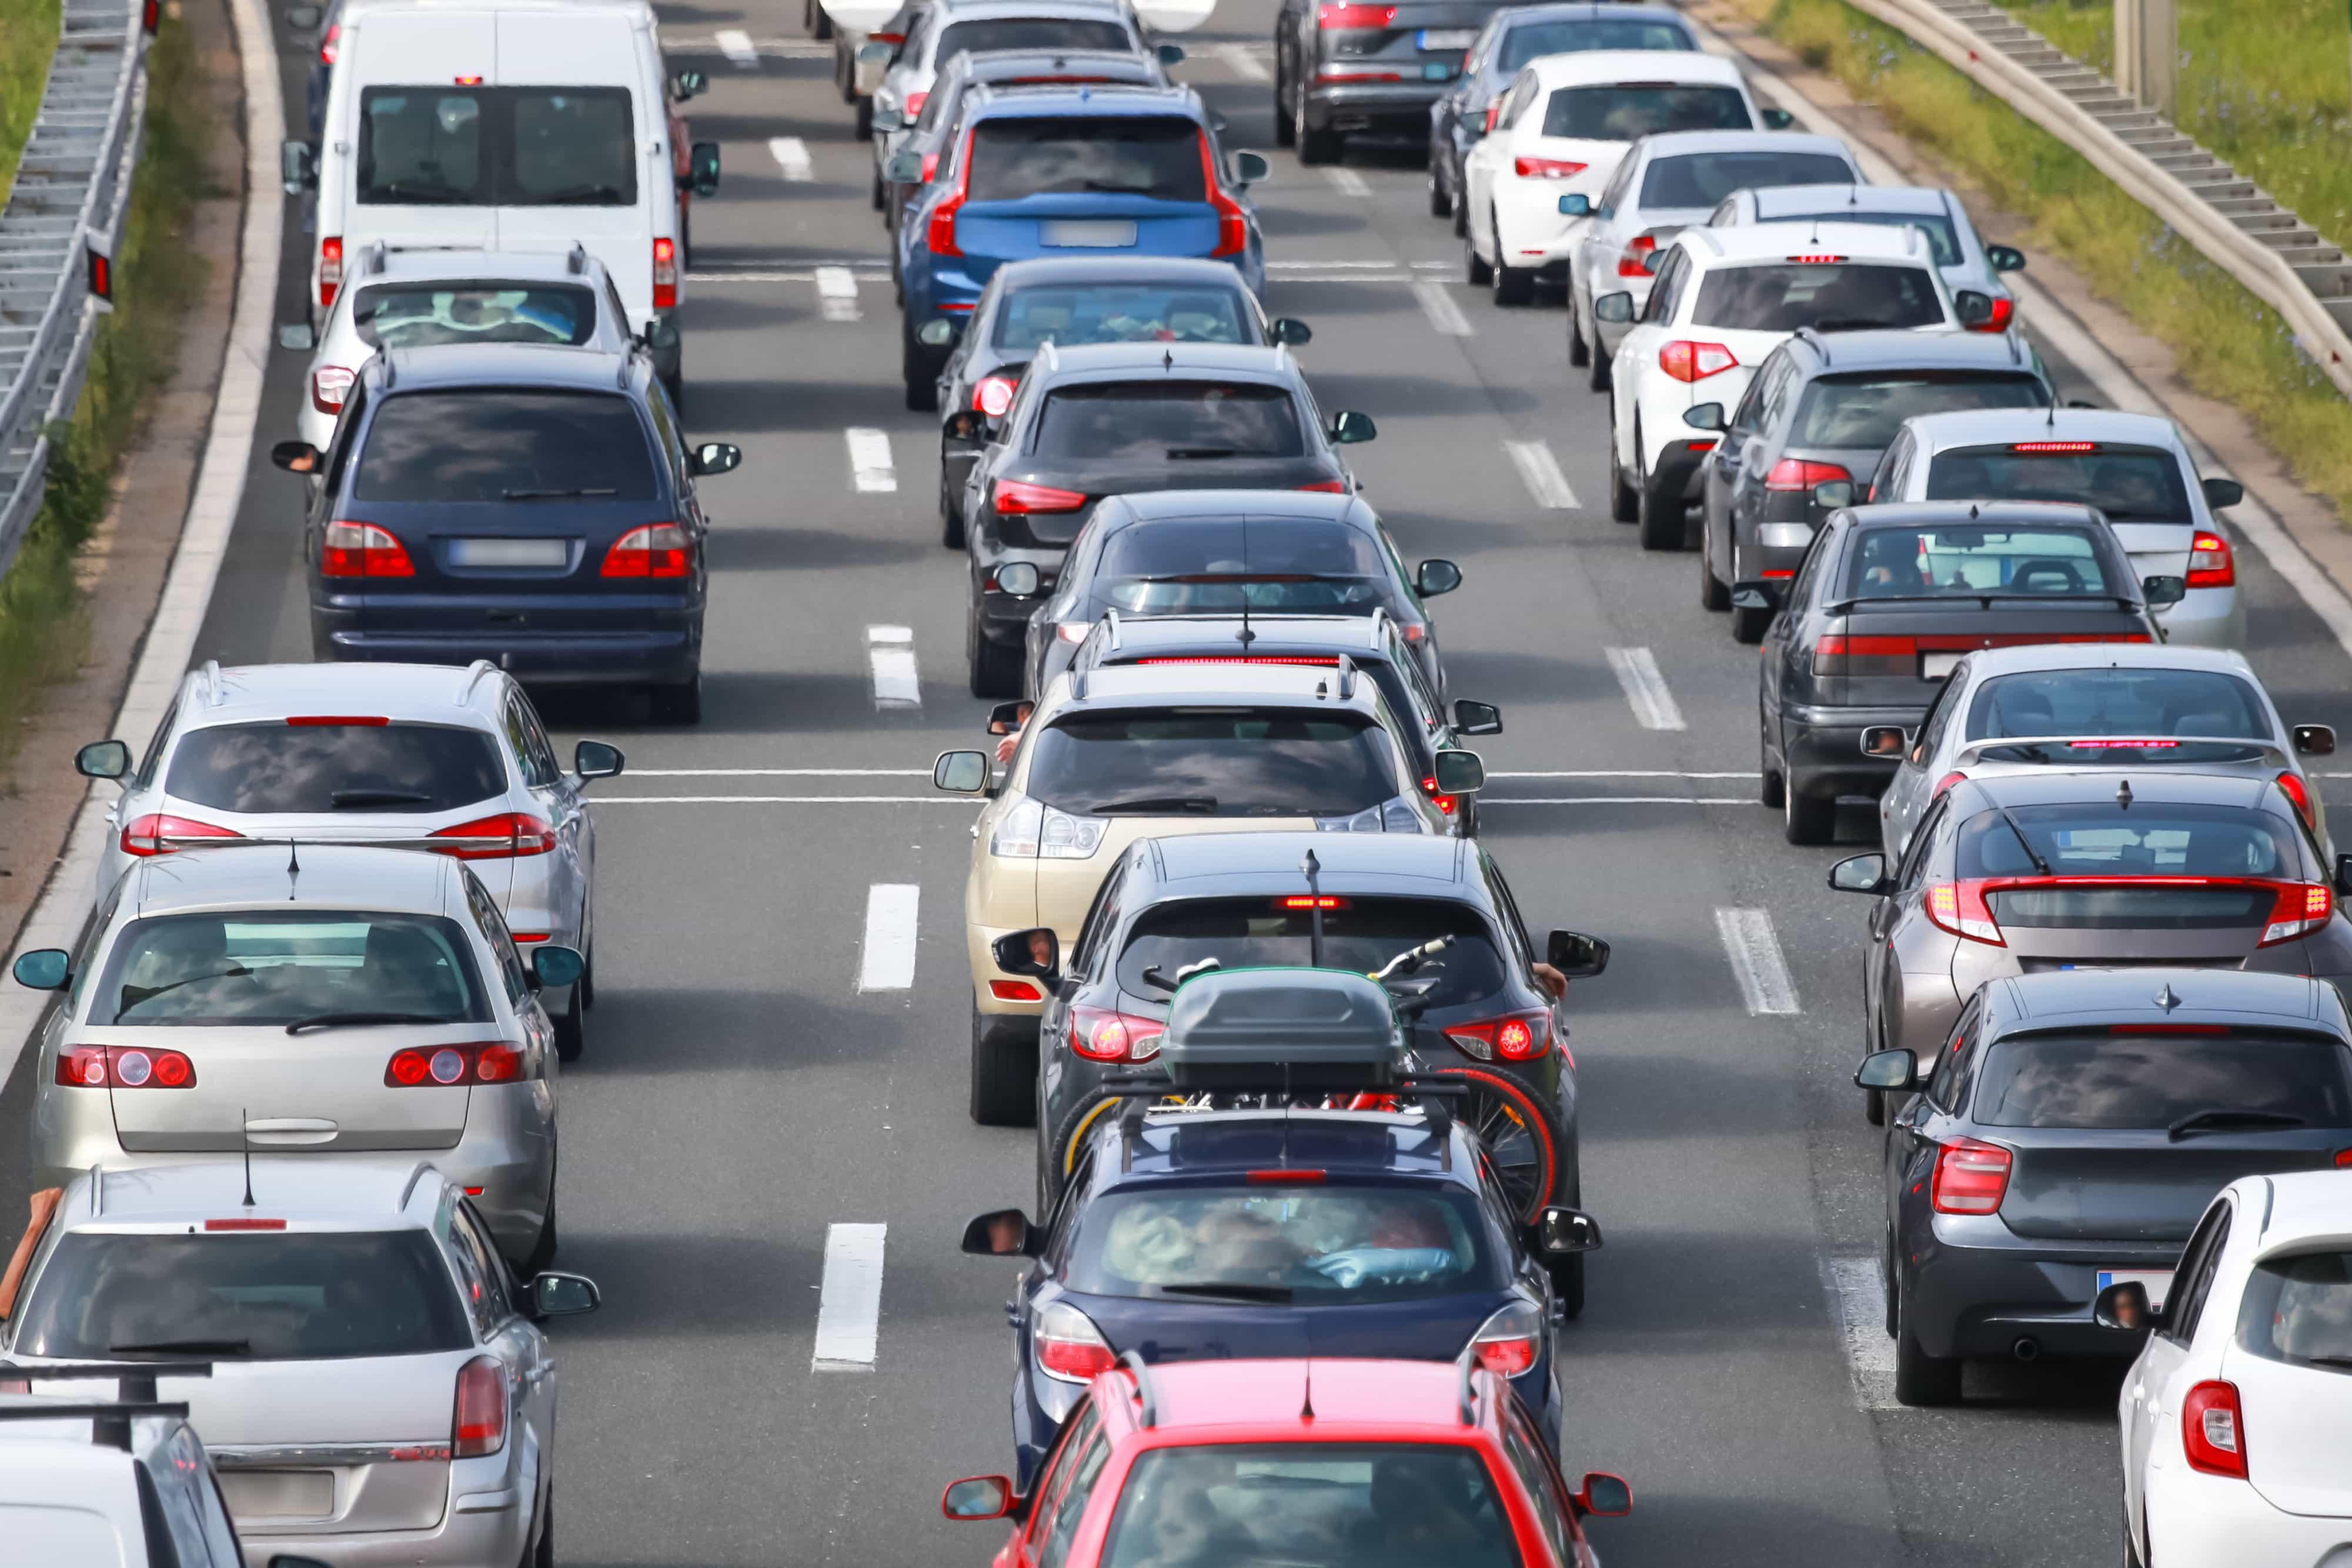 traffic-jam-4000x2667.jpeg